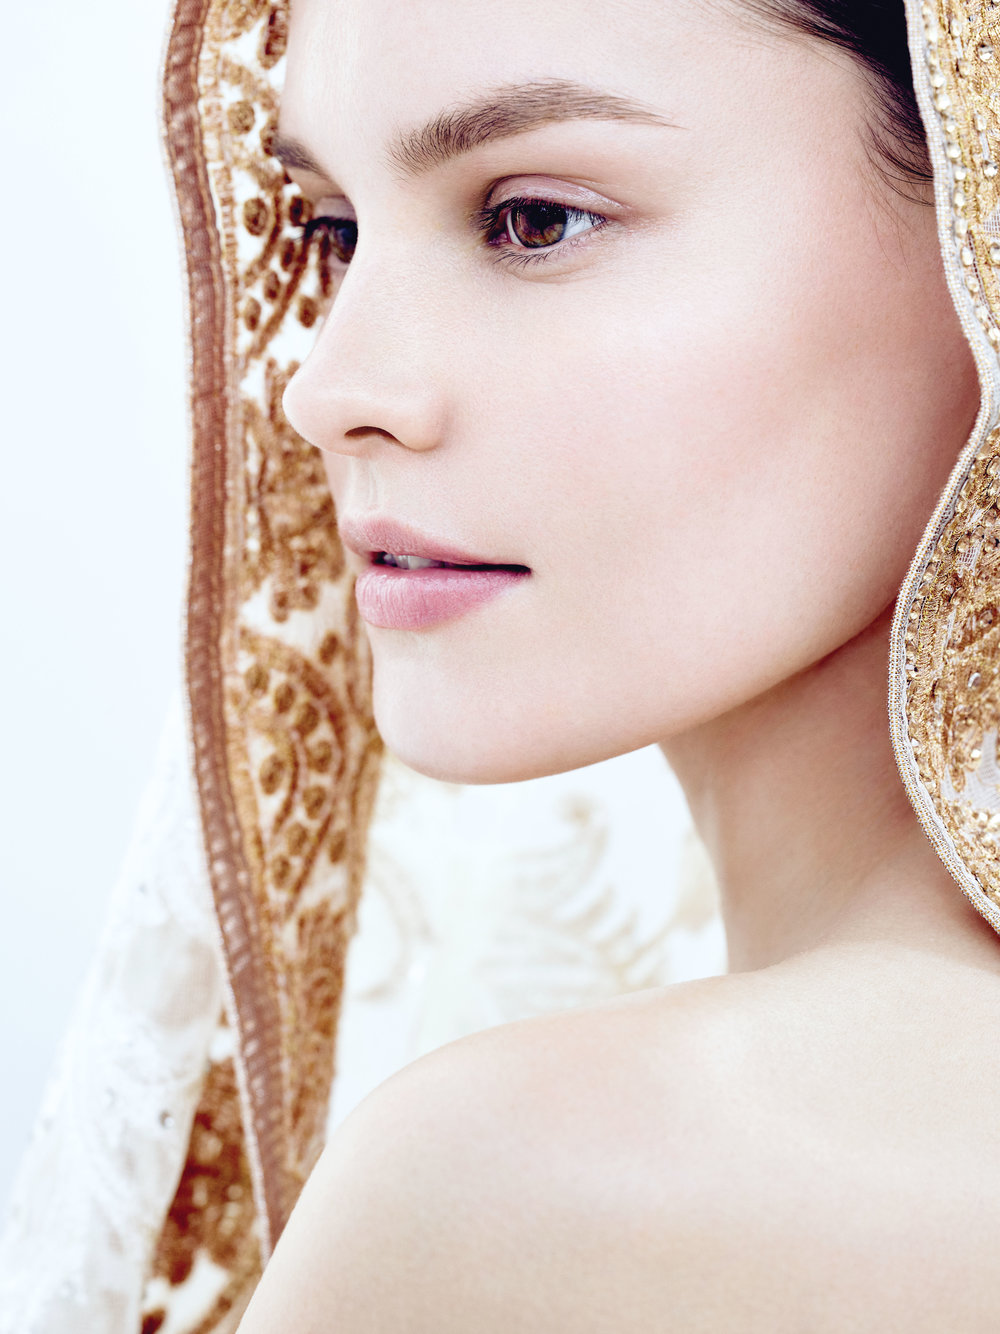 Tulasara_Wedding_Masque_Overnight_beauty_image_2_vertical.jpg